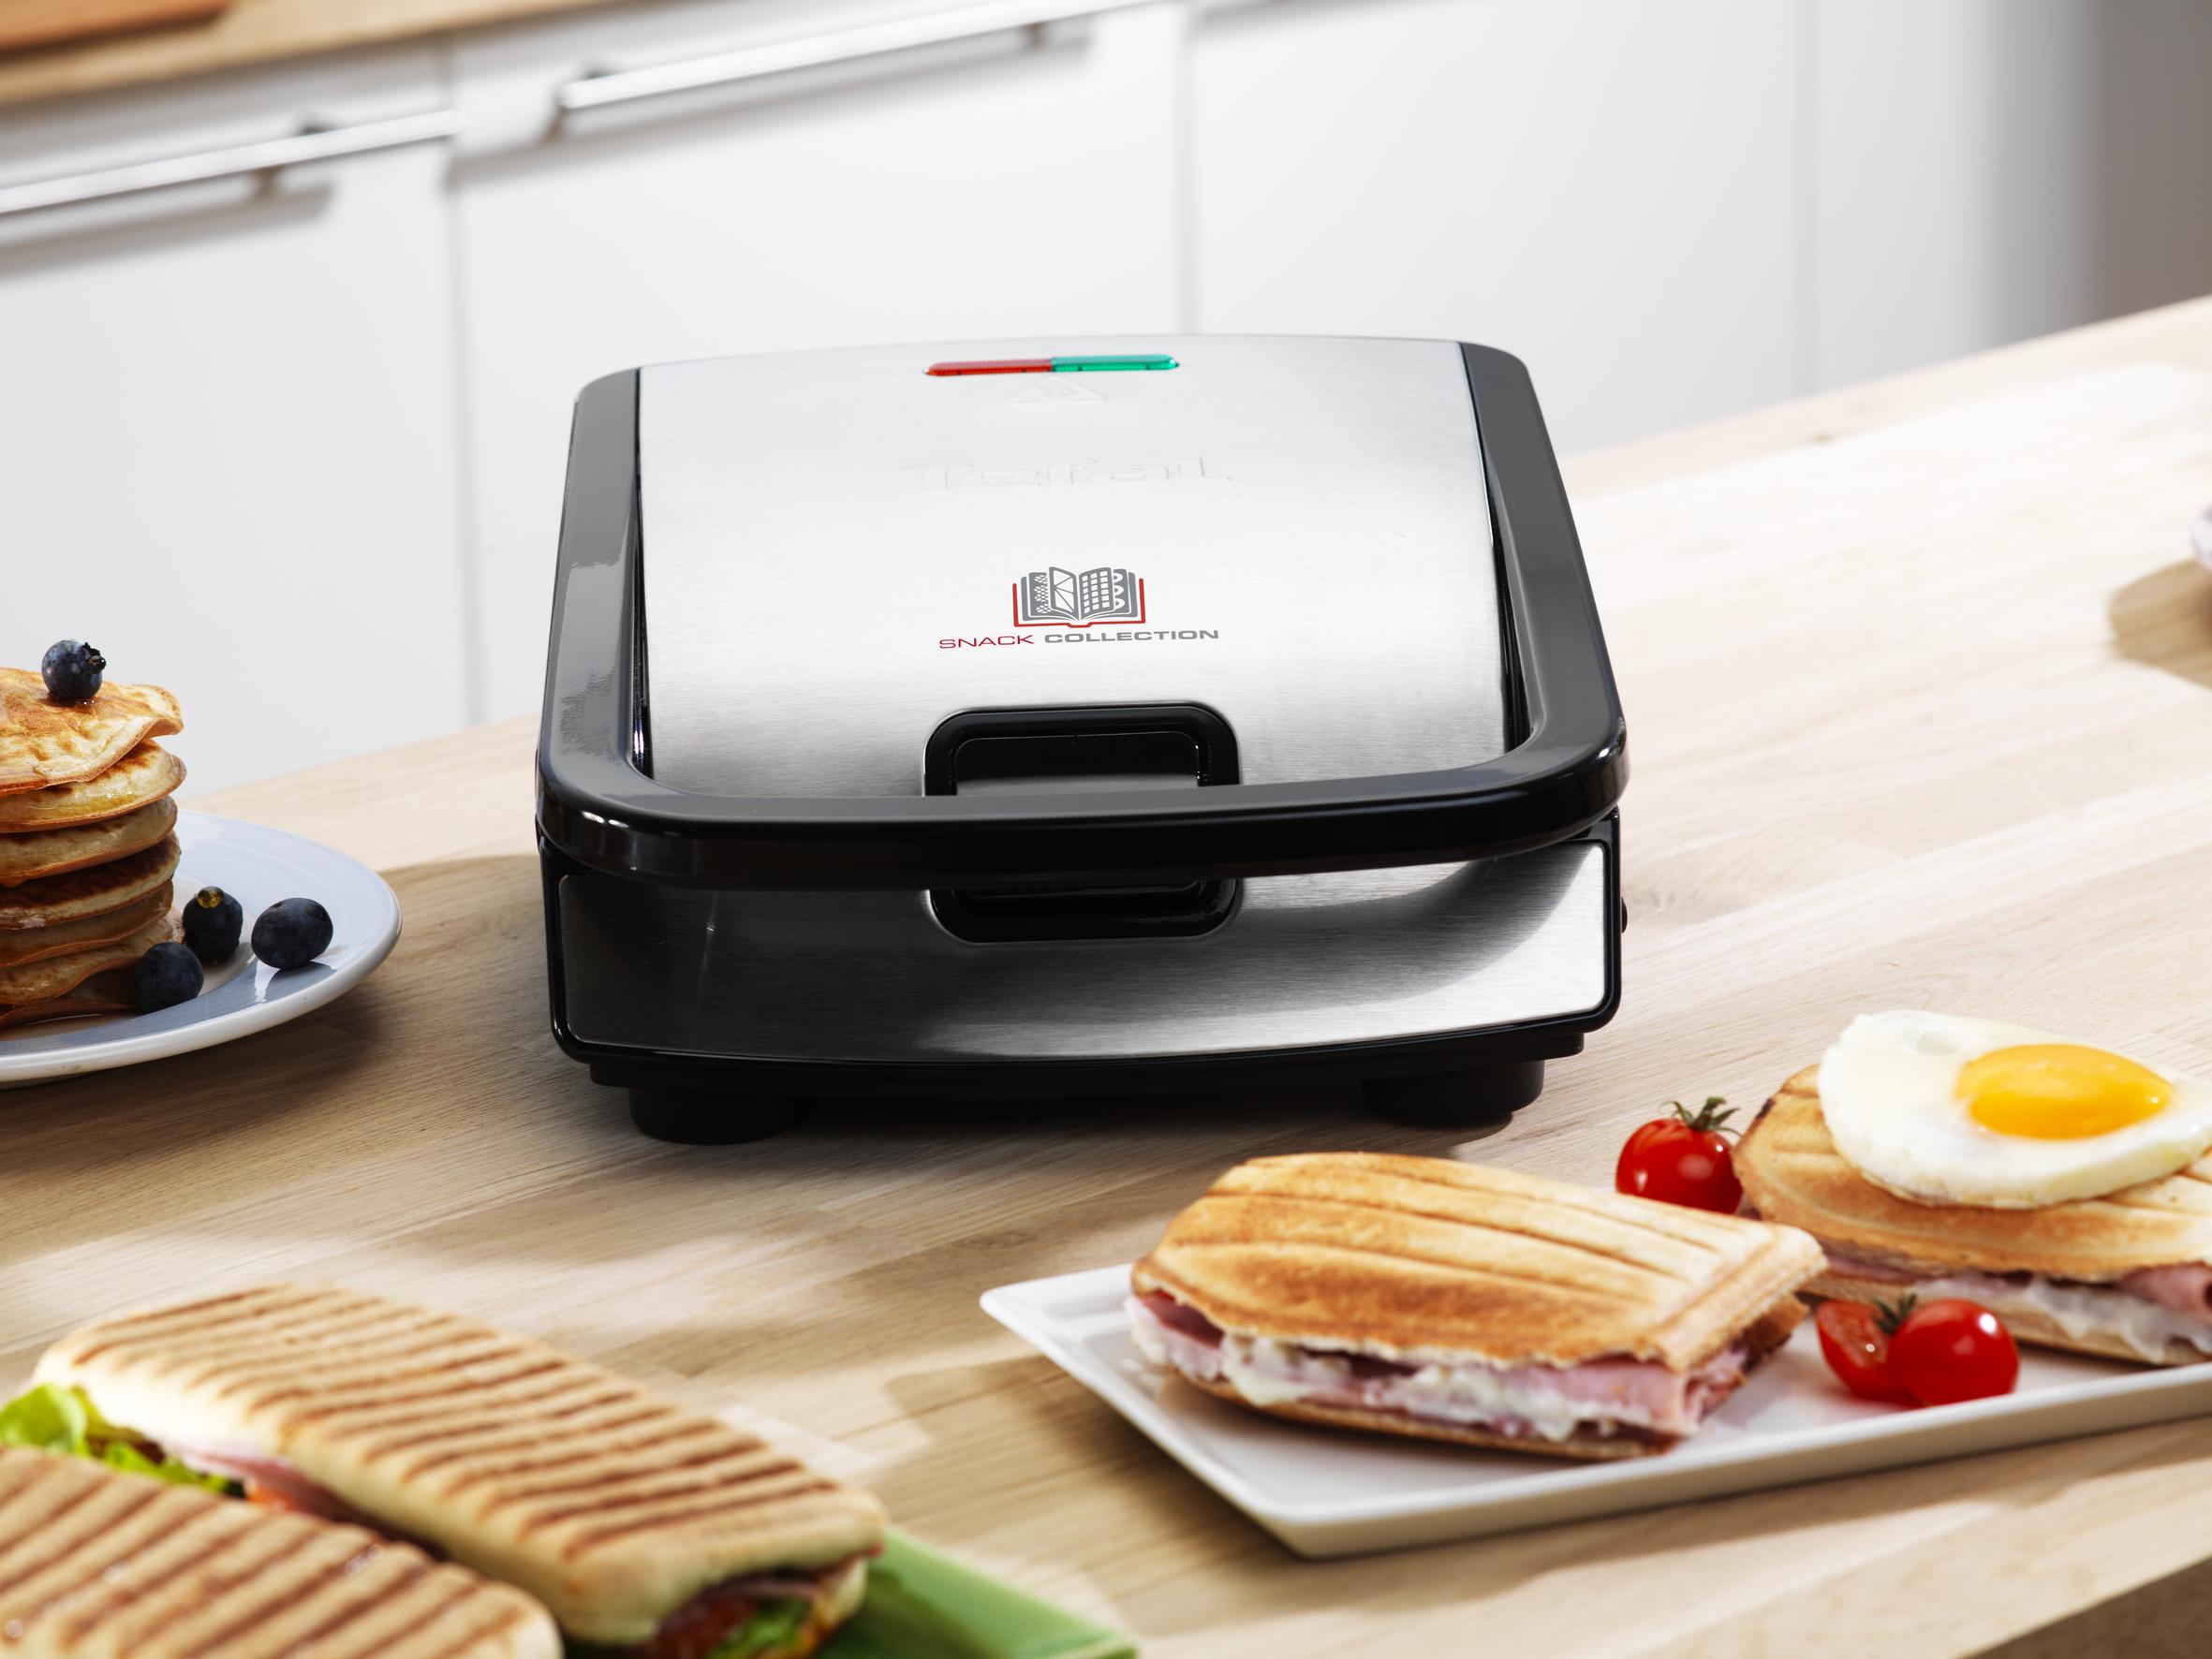 TEFAL-Snack-collection-Sandwich-maker-waffle-maker-700-W-black-stainle-SW852D miniatura 5